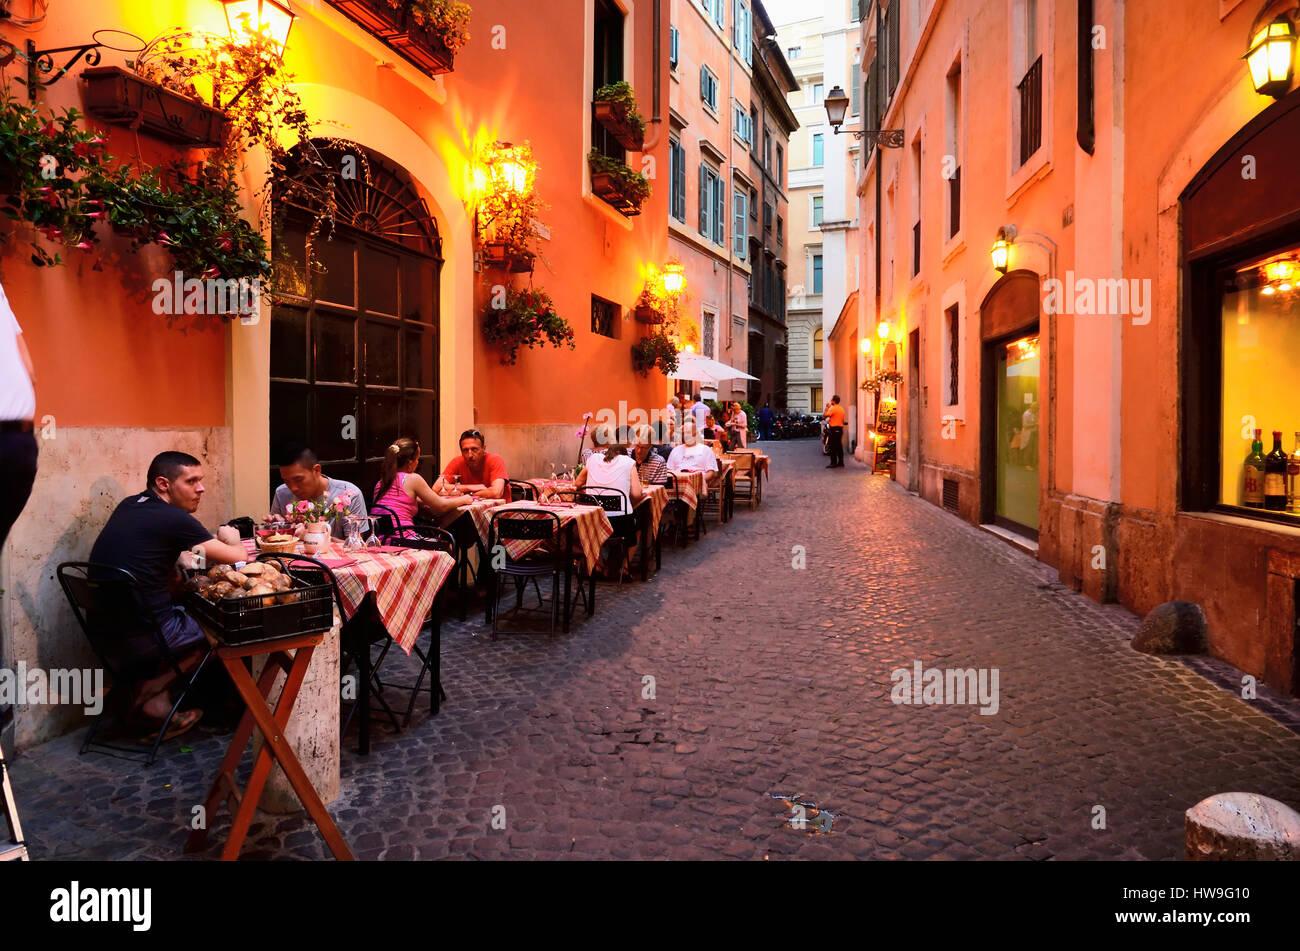 Gasse Mit Restaurant Terrasse Rom Lazio Italien Europa Stockfoto